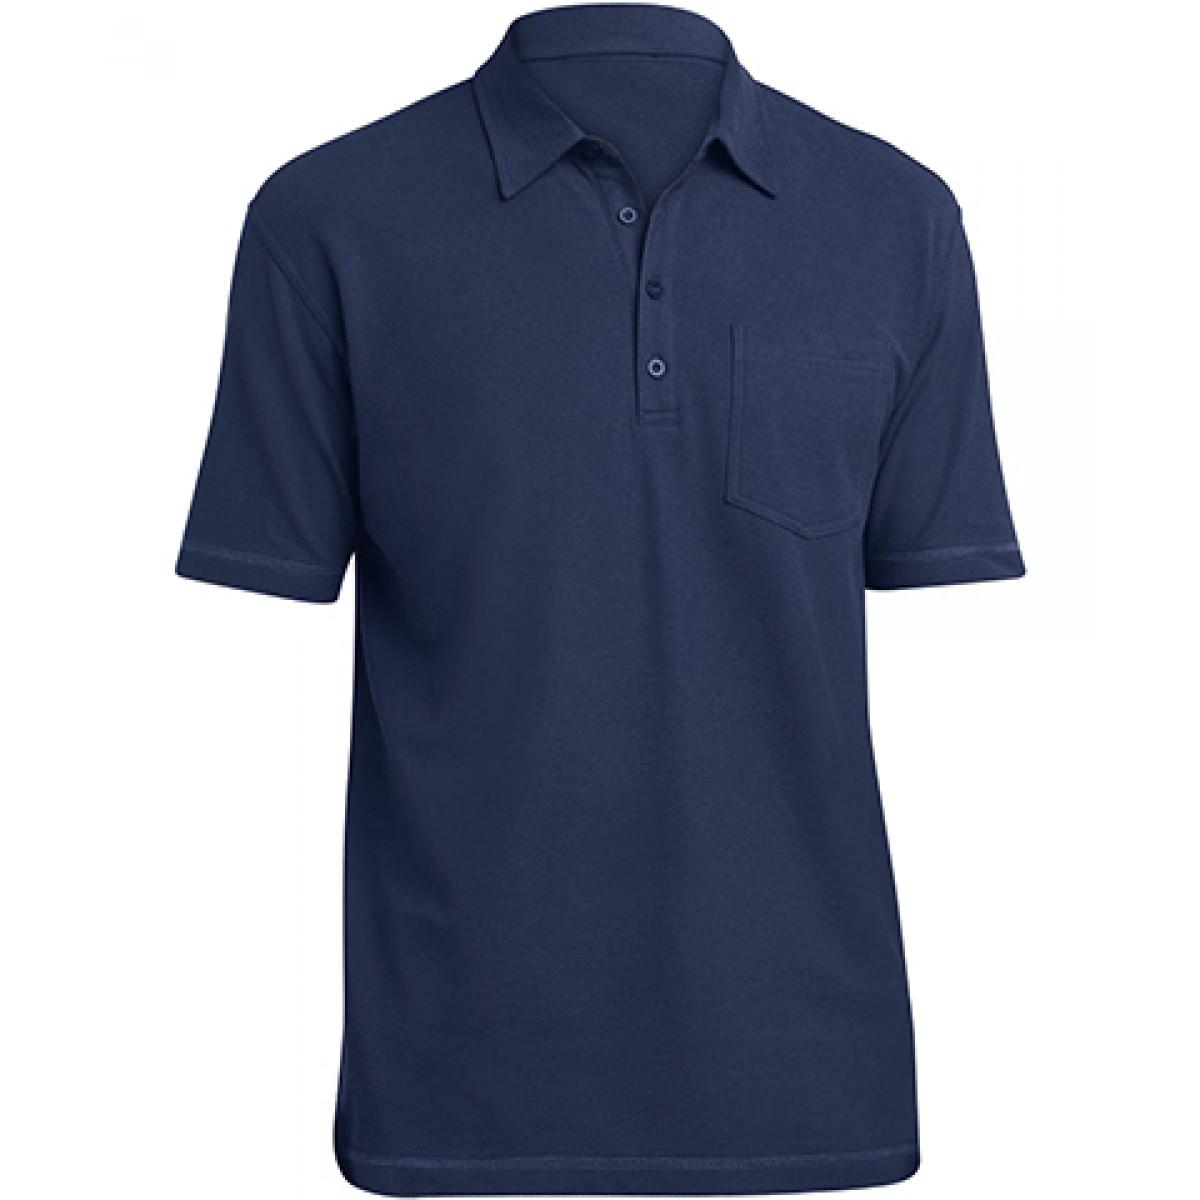 Modern Style Pocket Polo-Royal Blue-2XL